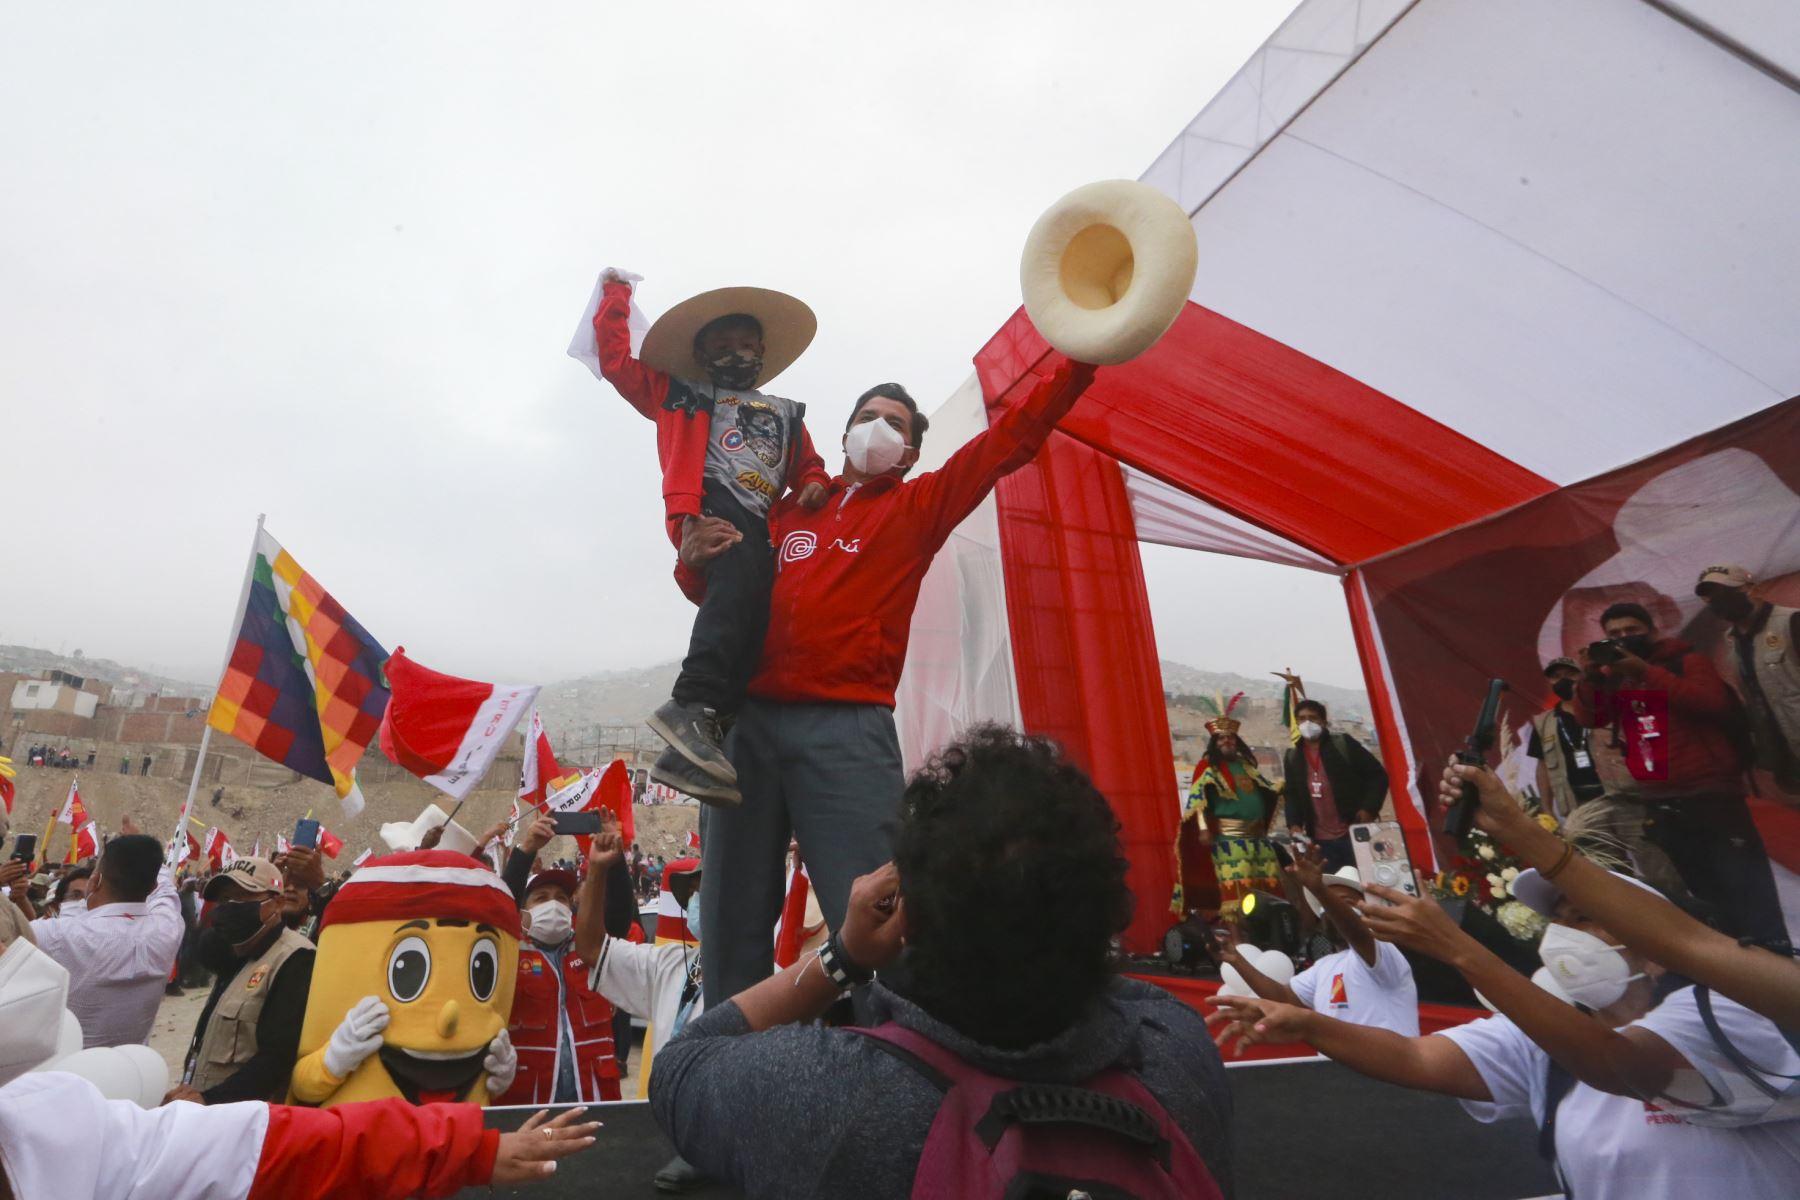 Candidato a la presidencia Pedro Castillo realiza mitin en Manchay, Lima.  Foto: ANDINA/Jhony Laurente